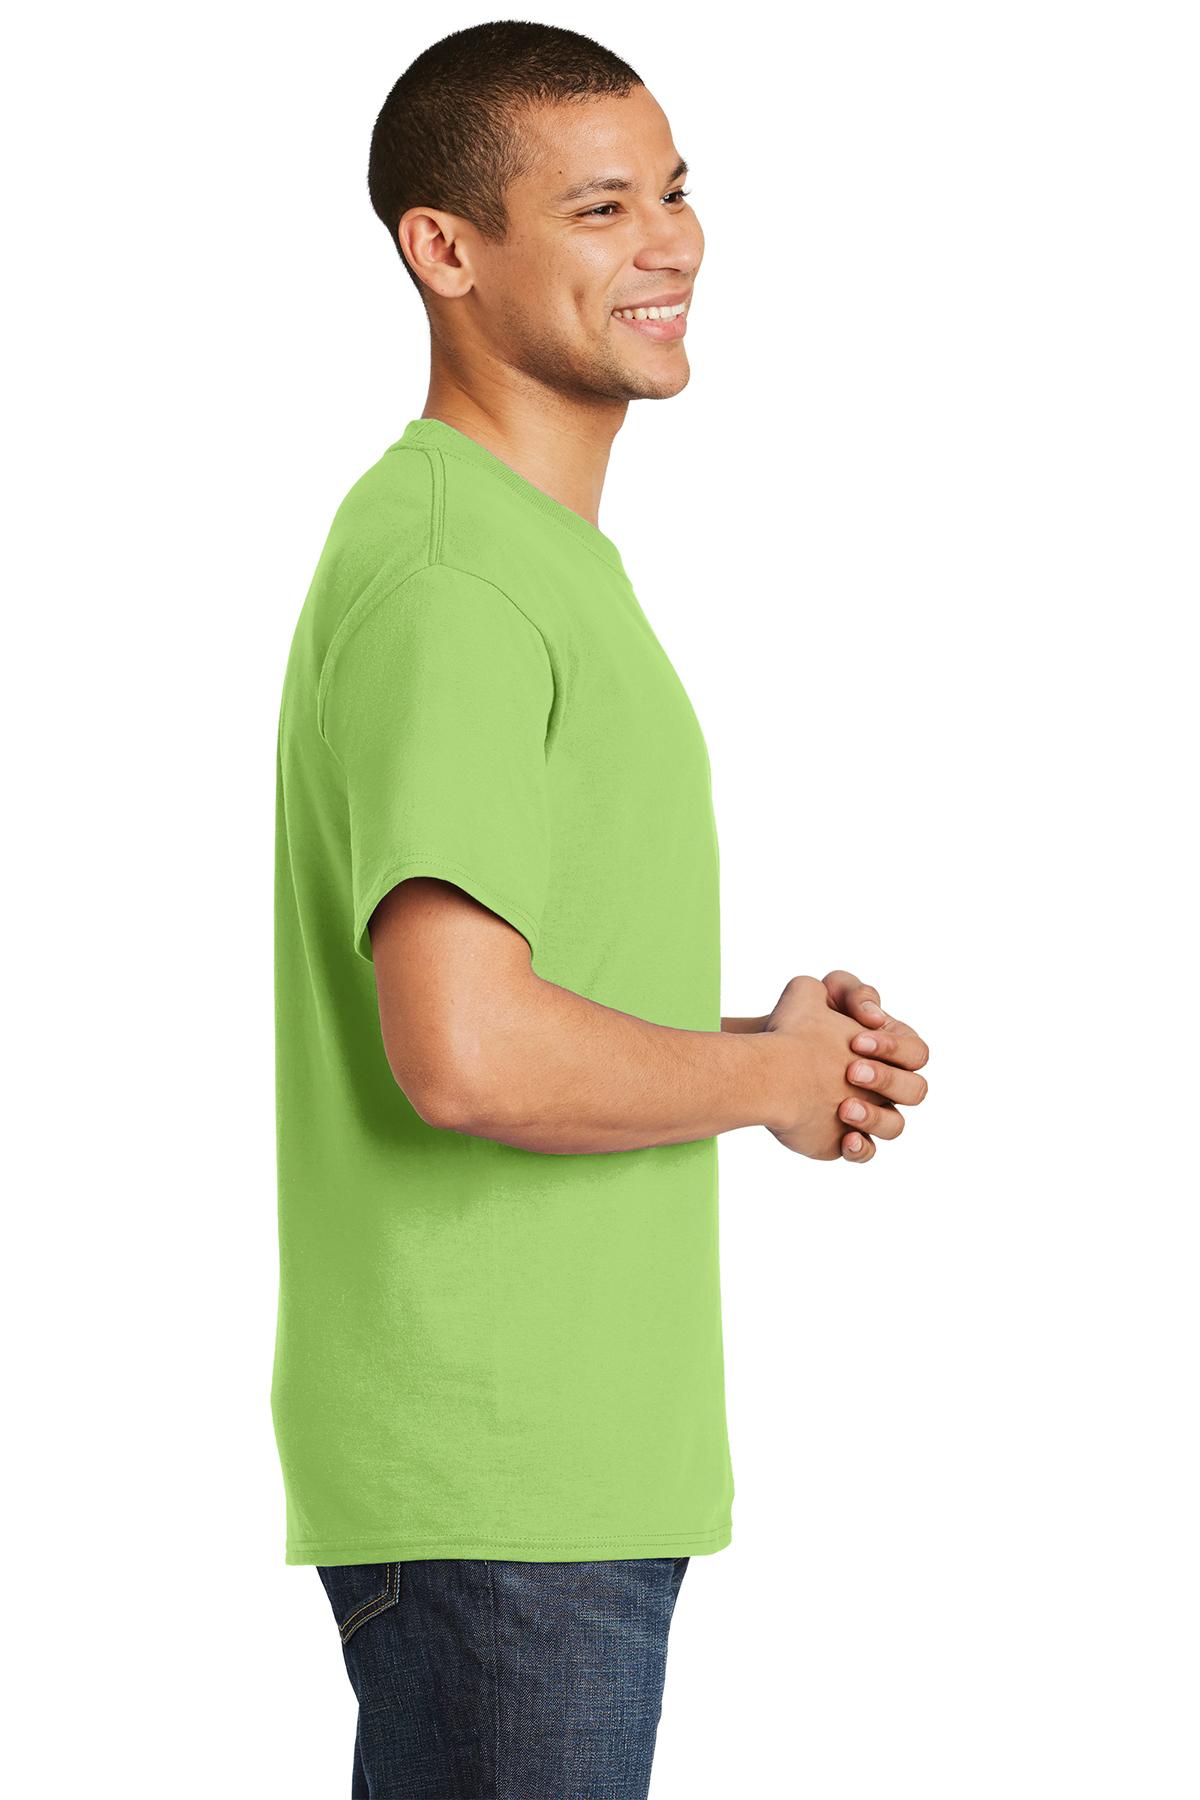 e2732399 Hanes® Beefy-T® - 100% Cotton T-Shirt   6-6.1 100% Cotton   T-Shirts ...